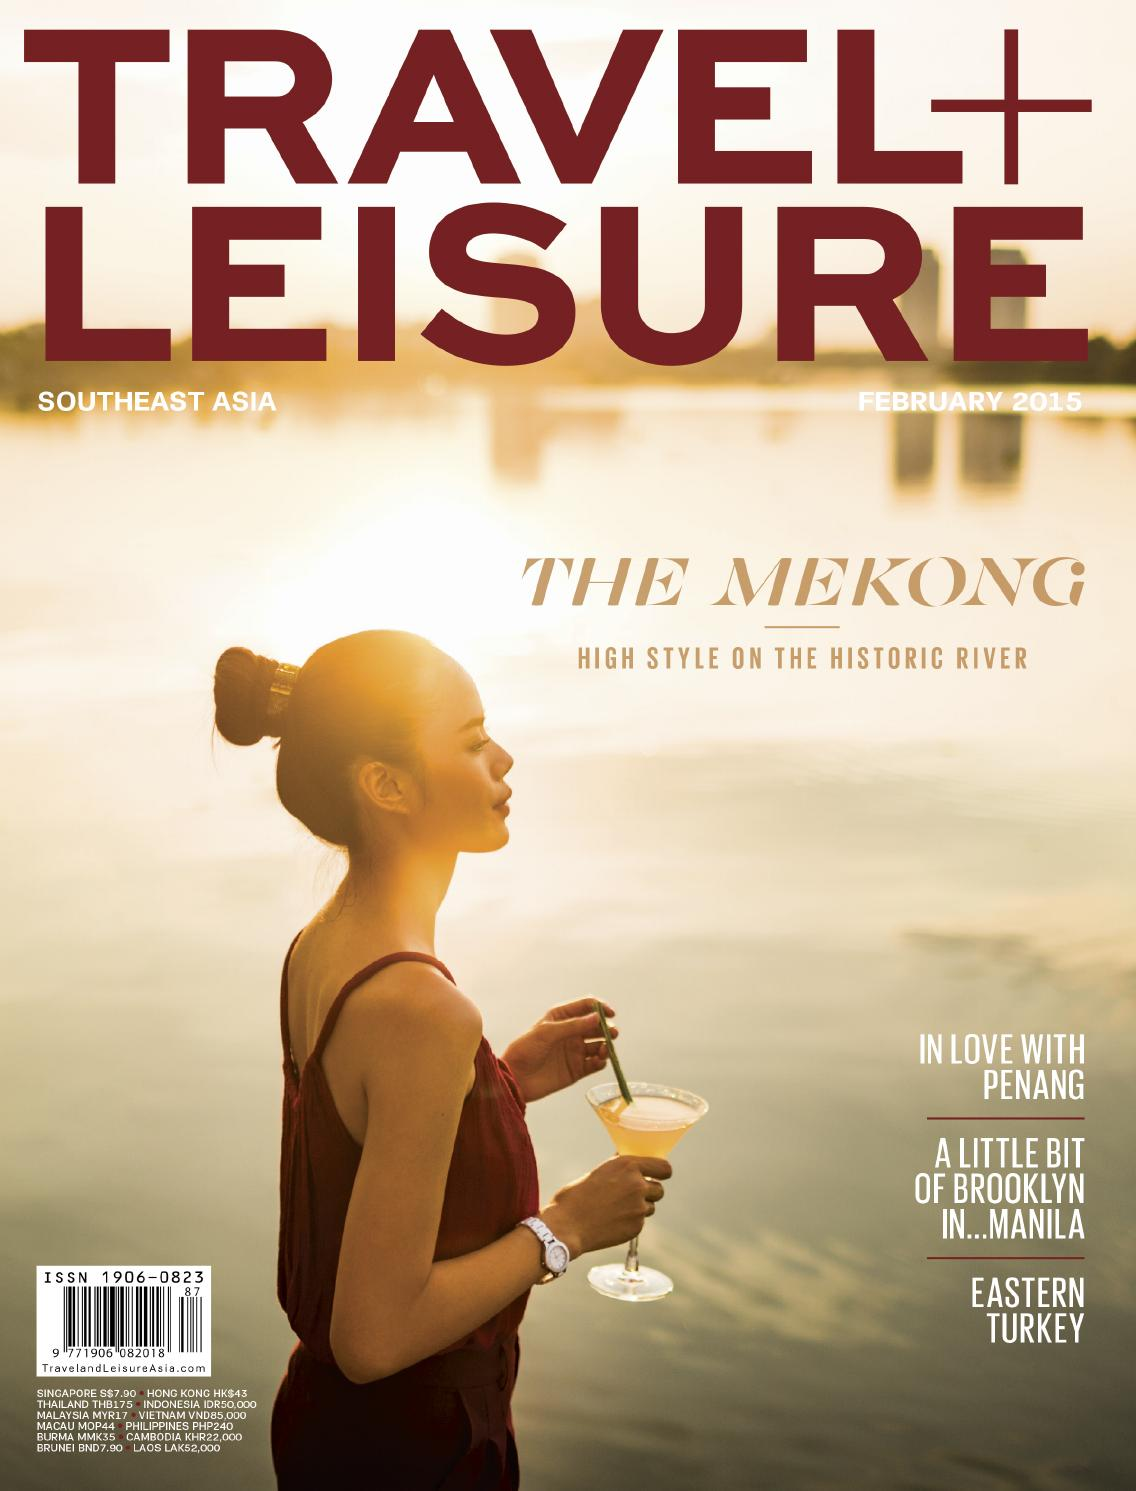 February 2015 by Travel + Leisure Southeast Asia - issuu